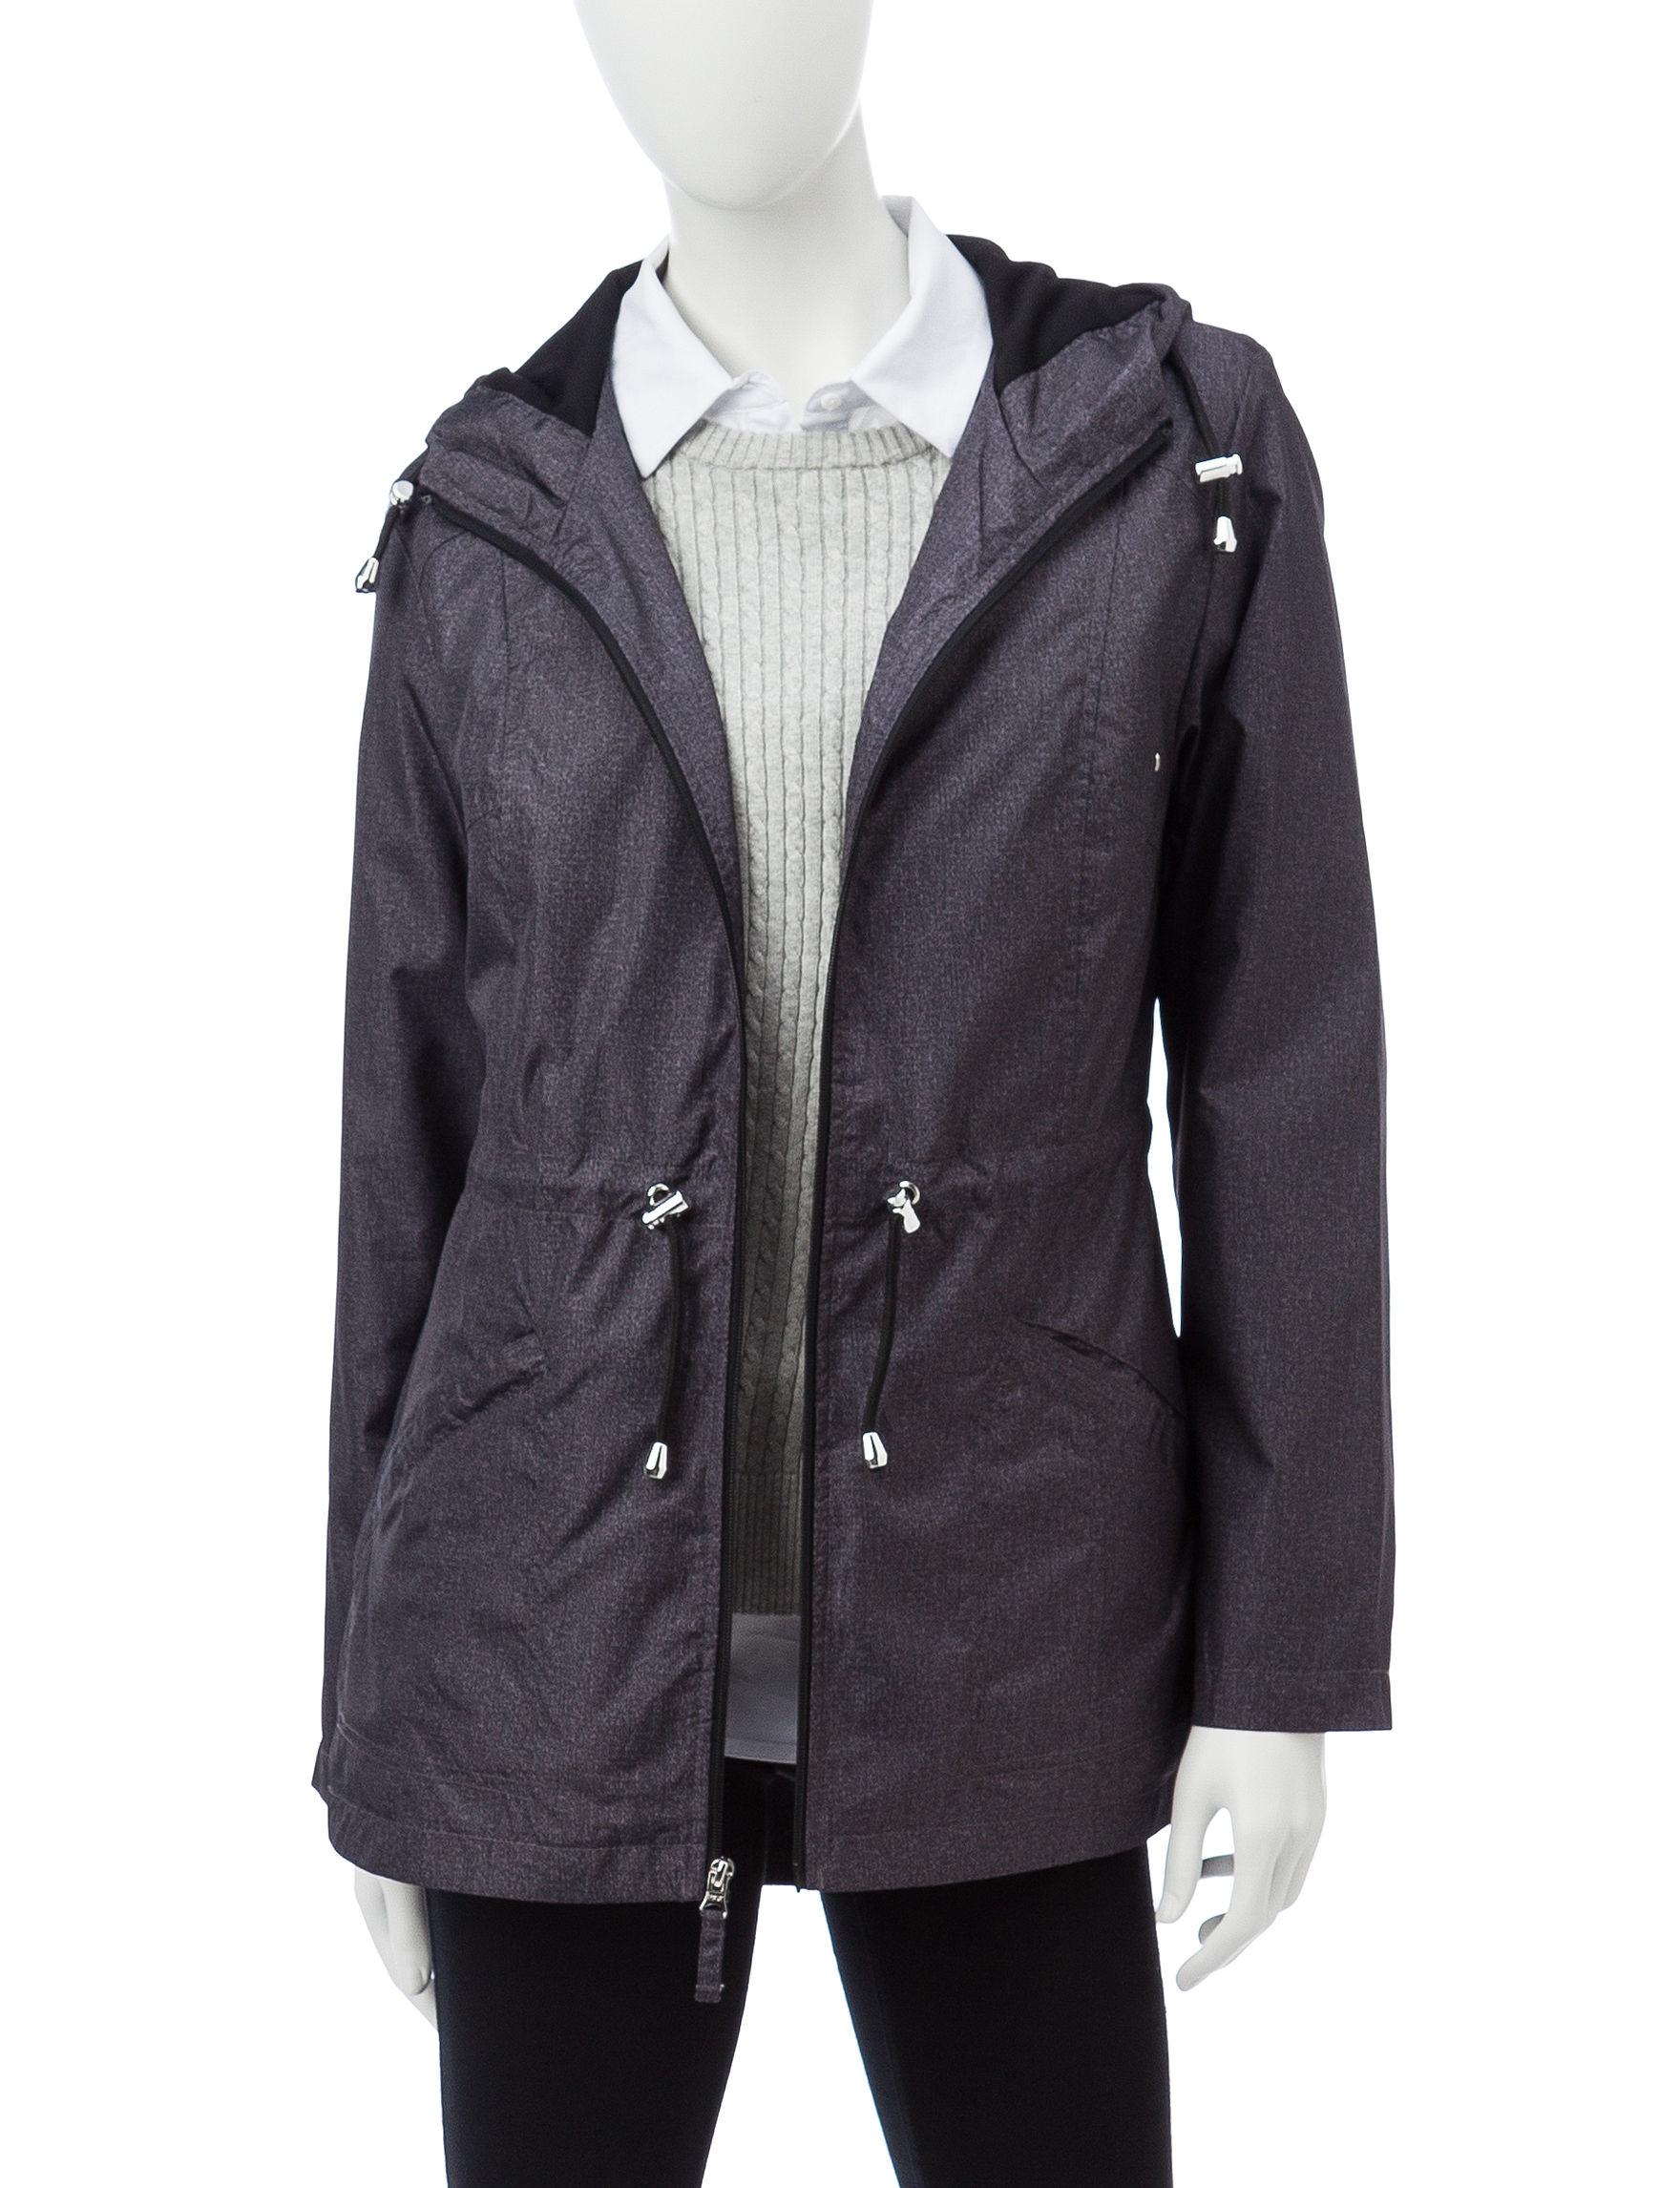 Details Black Lightweight Jackets & Blazers Rain & Snow Jackets